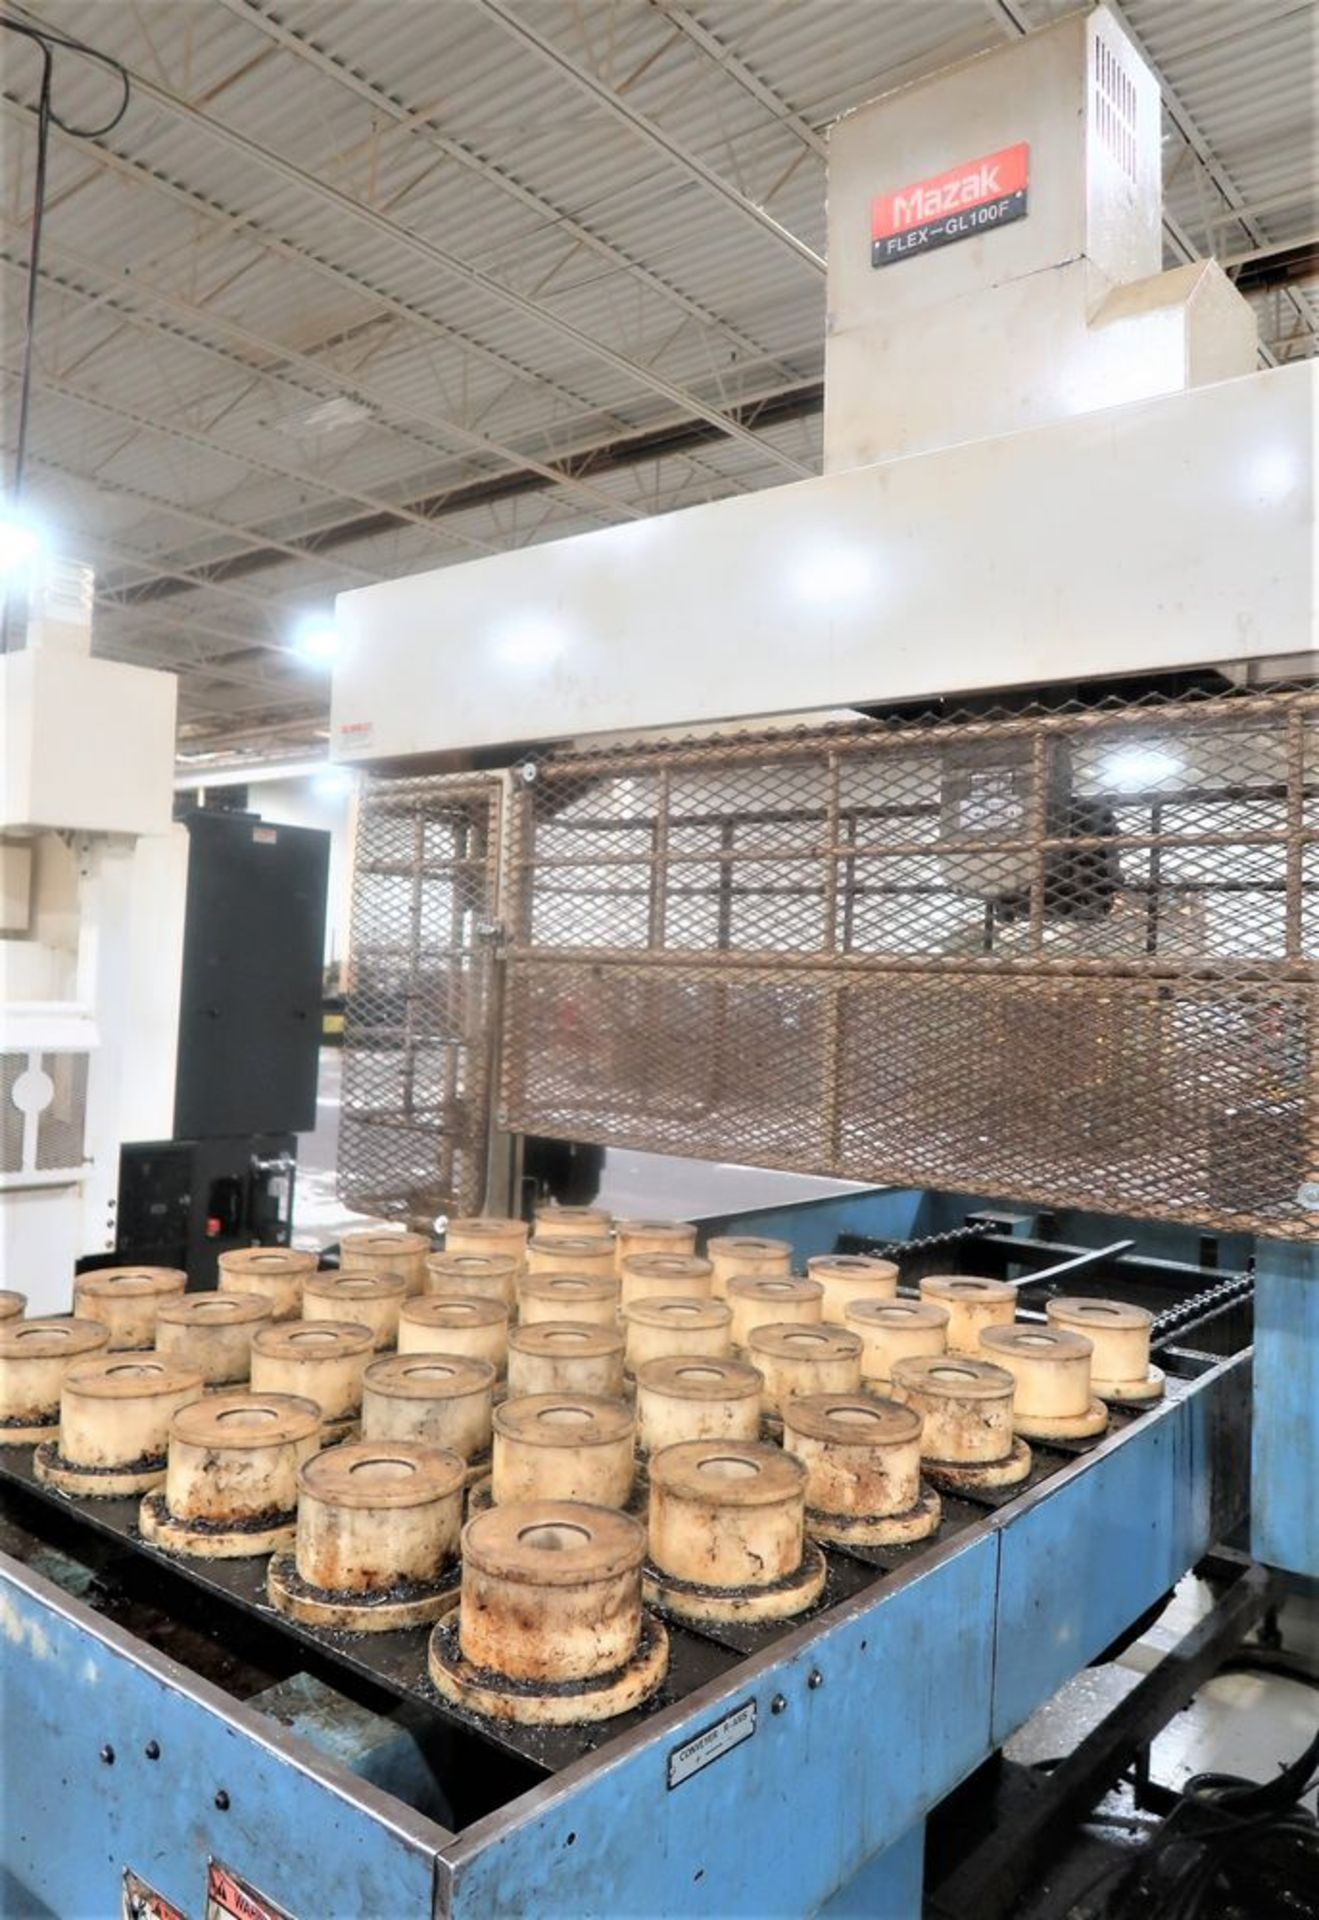 Mazak Dual Turn 25 Twin Spindle CNC Turning Center lathe, S/N 150888 - Image 3 of 13